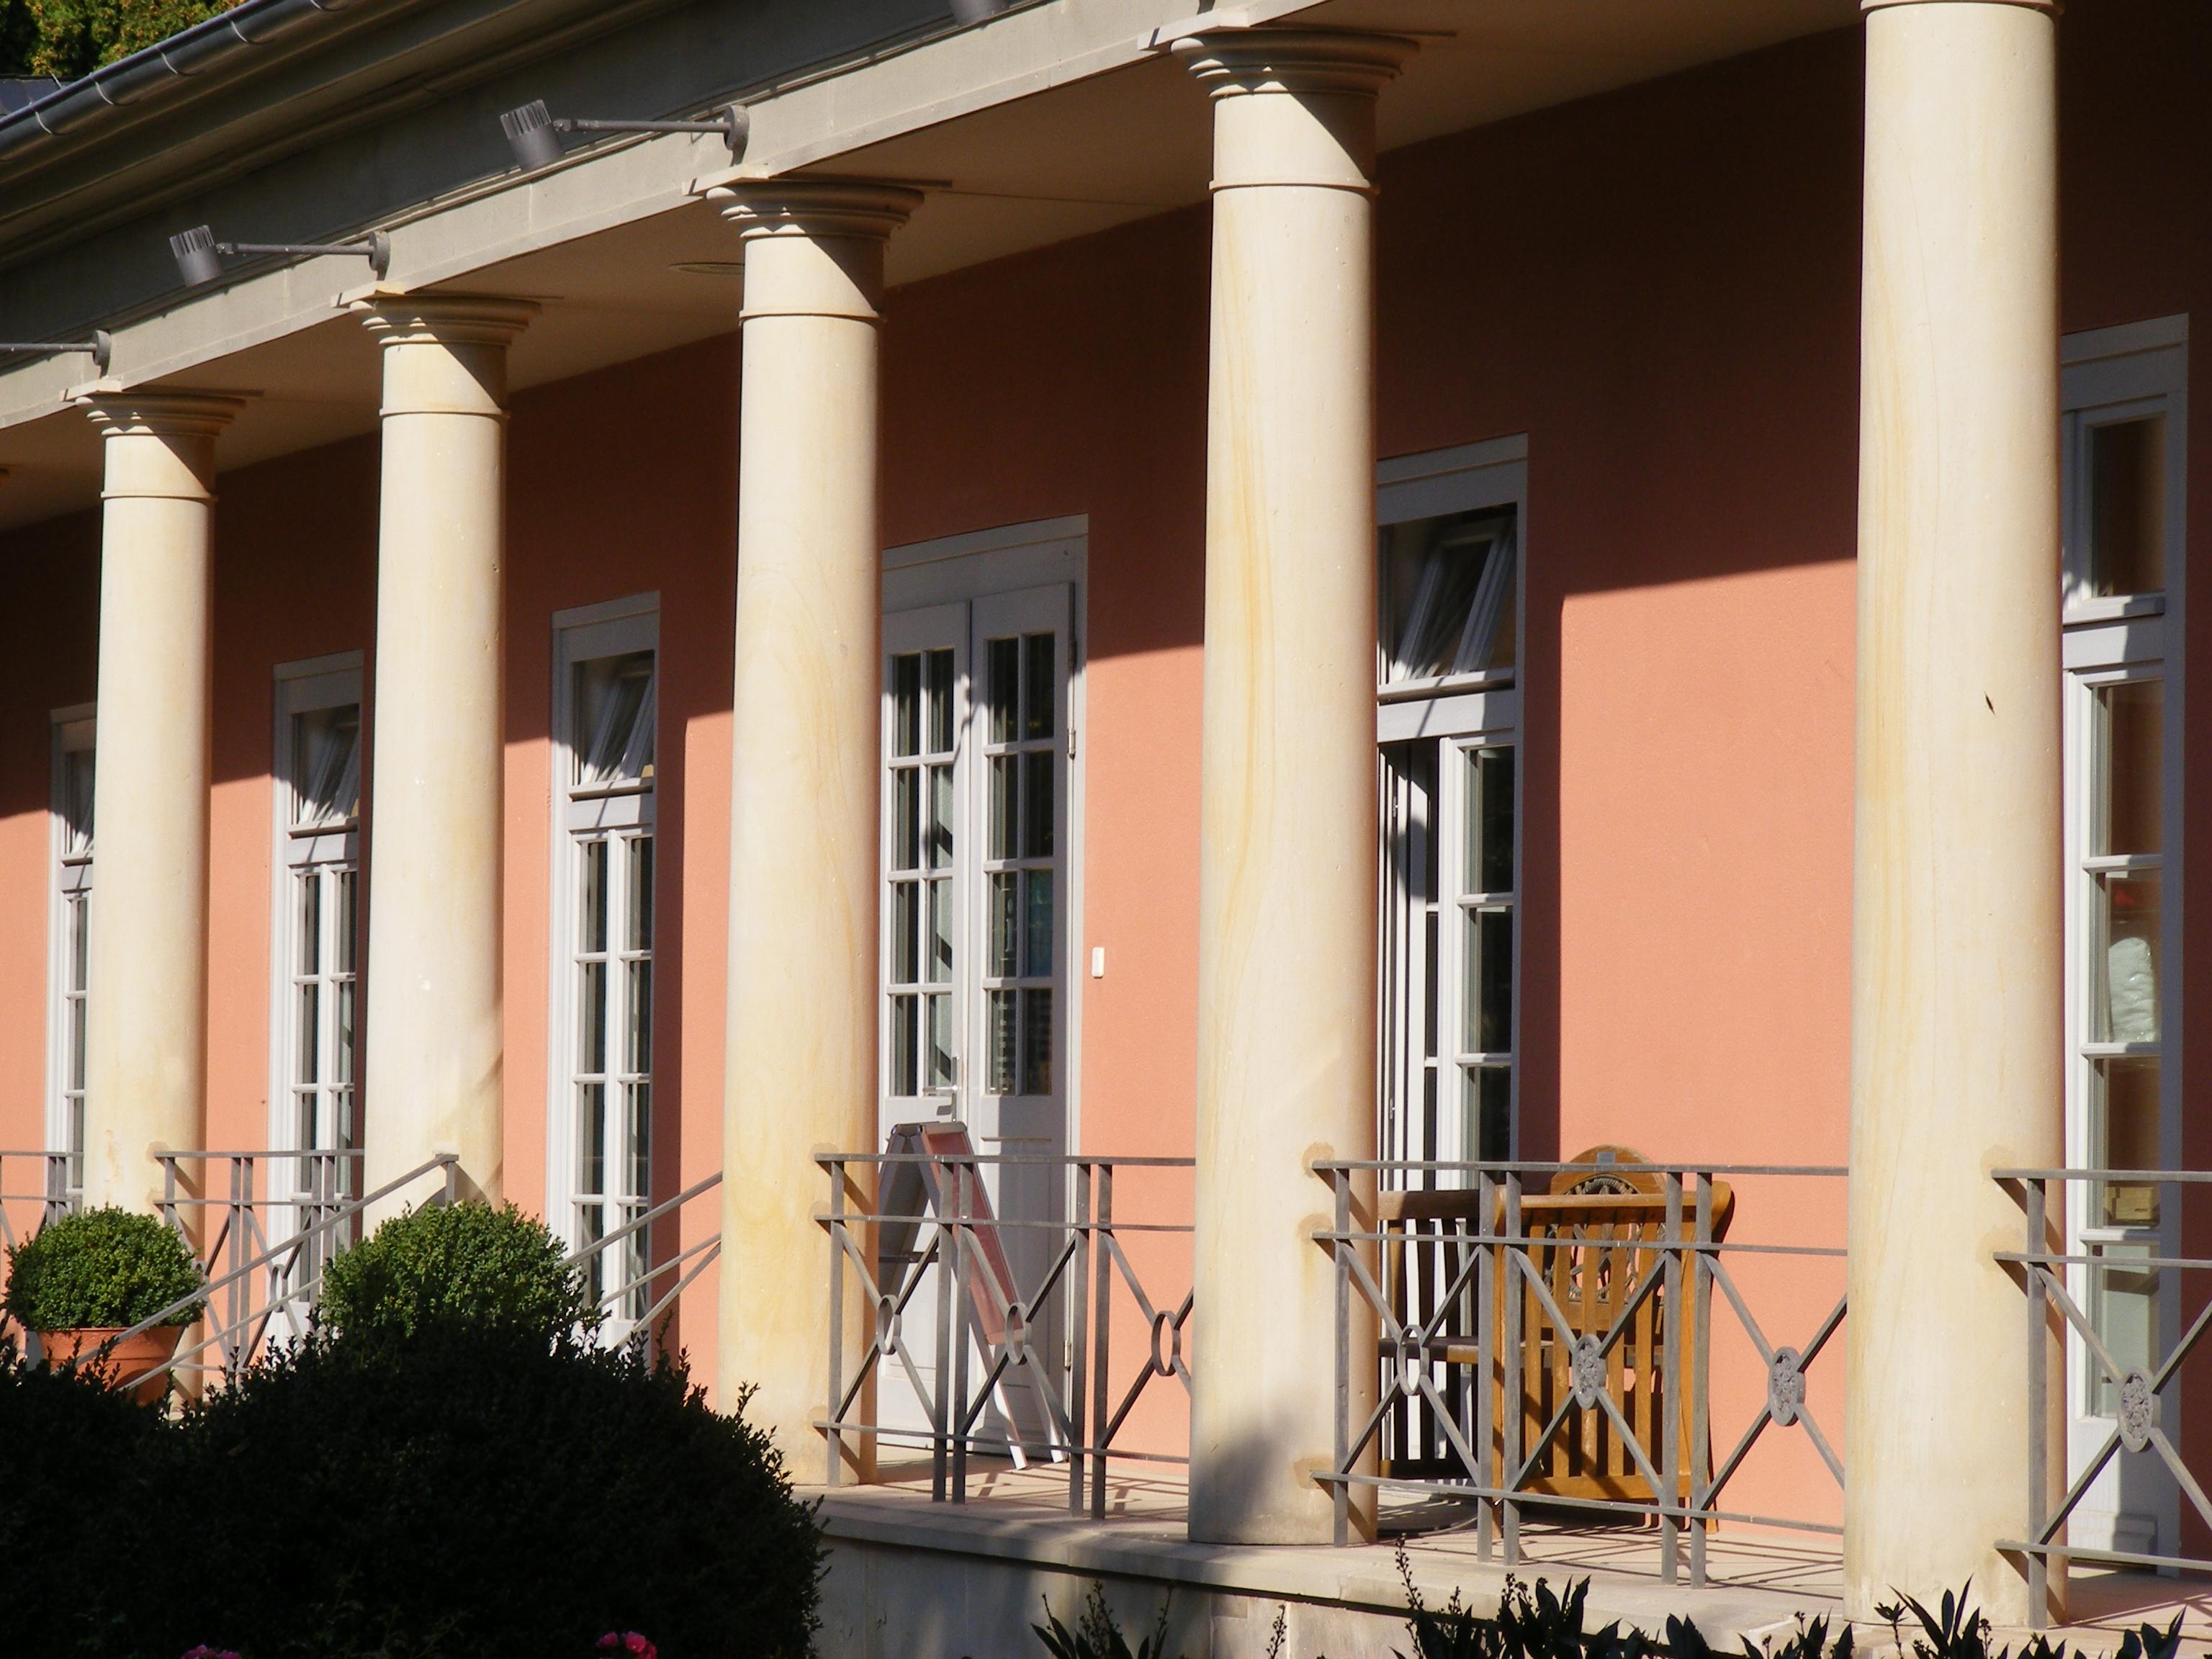 Wandelhalle Romantik Bad Rehburg